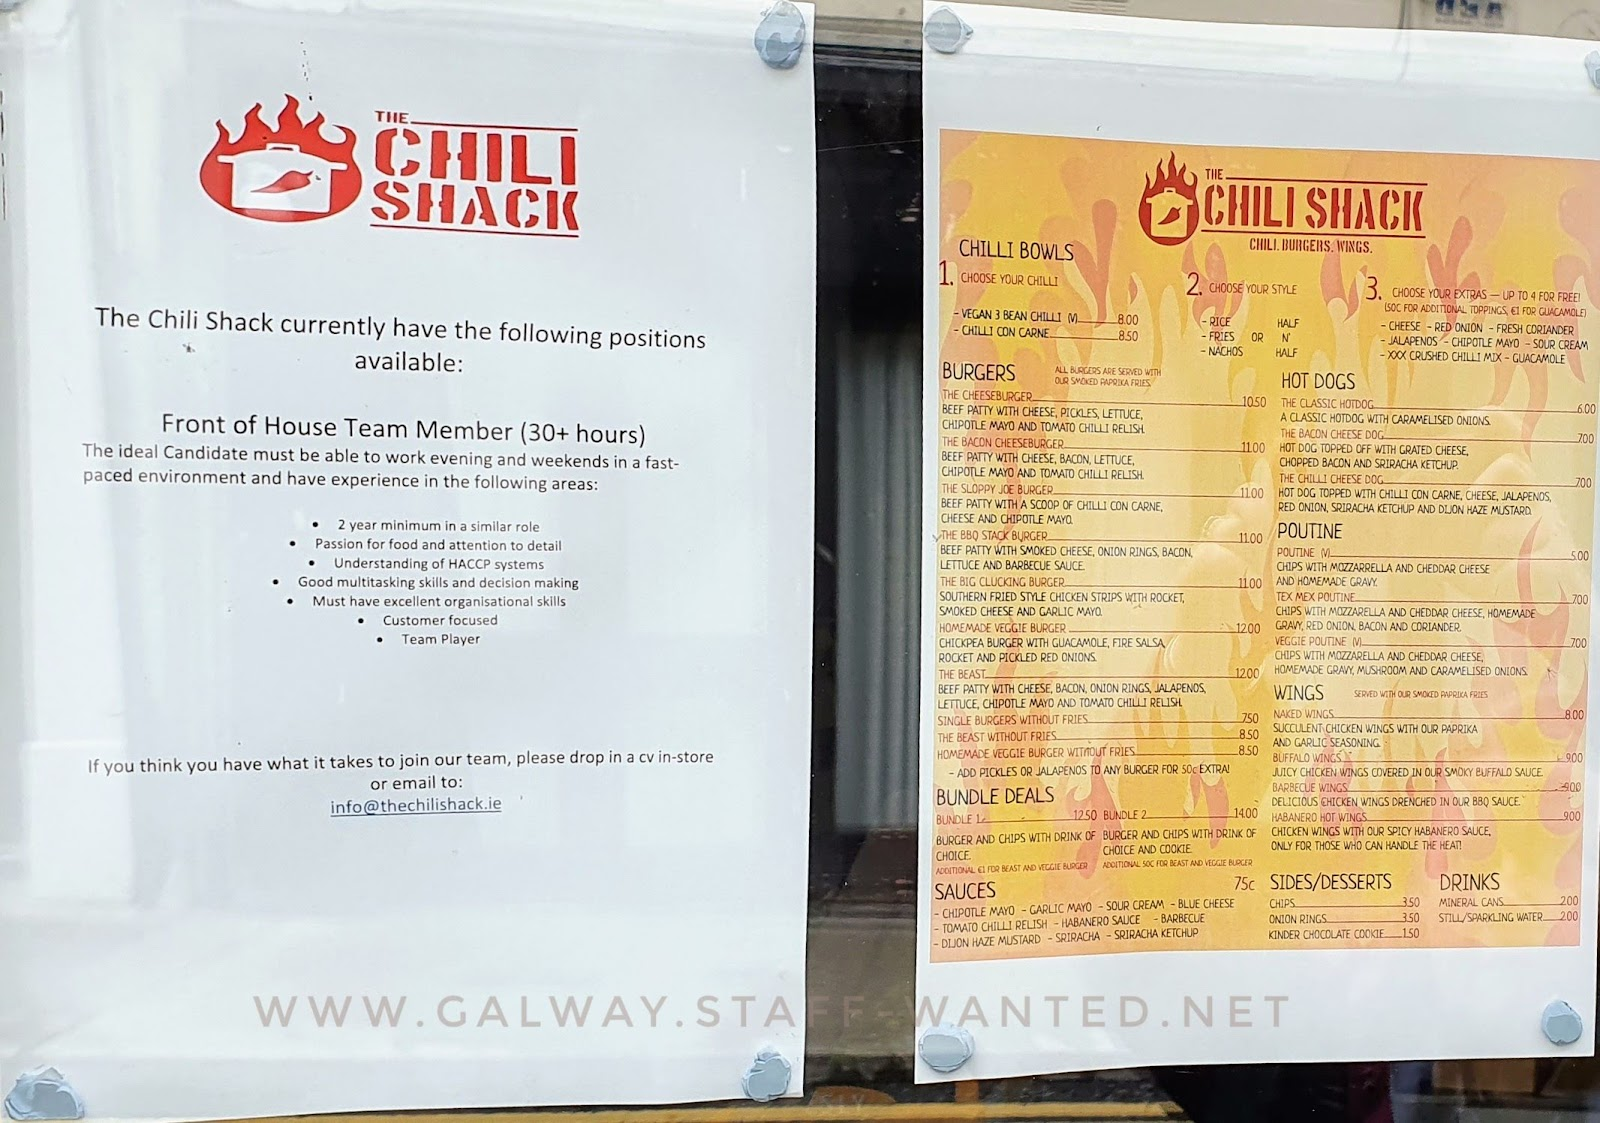 Job advert and full Chilli-shack takeaway menu